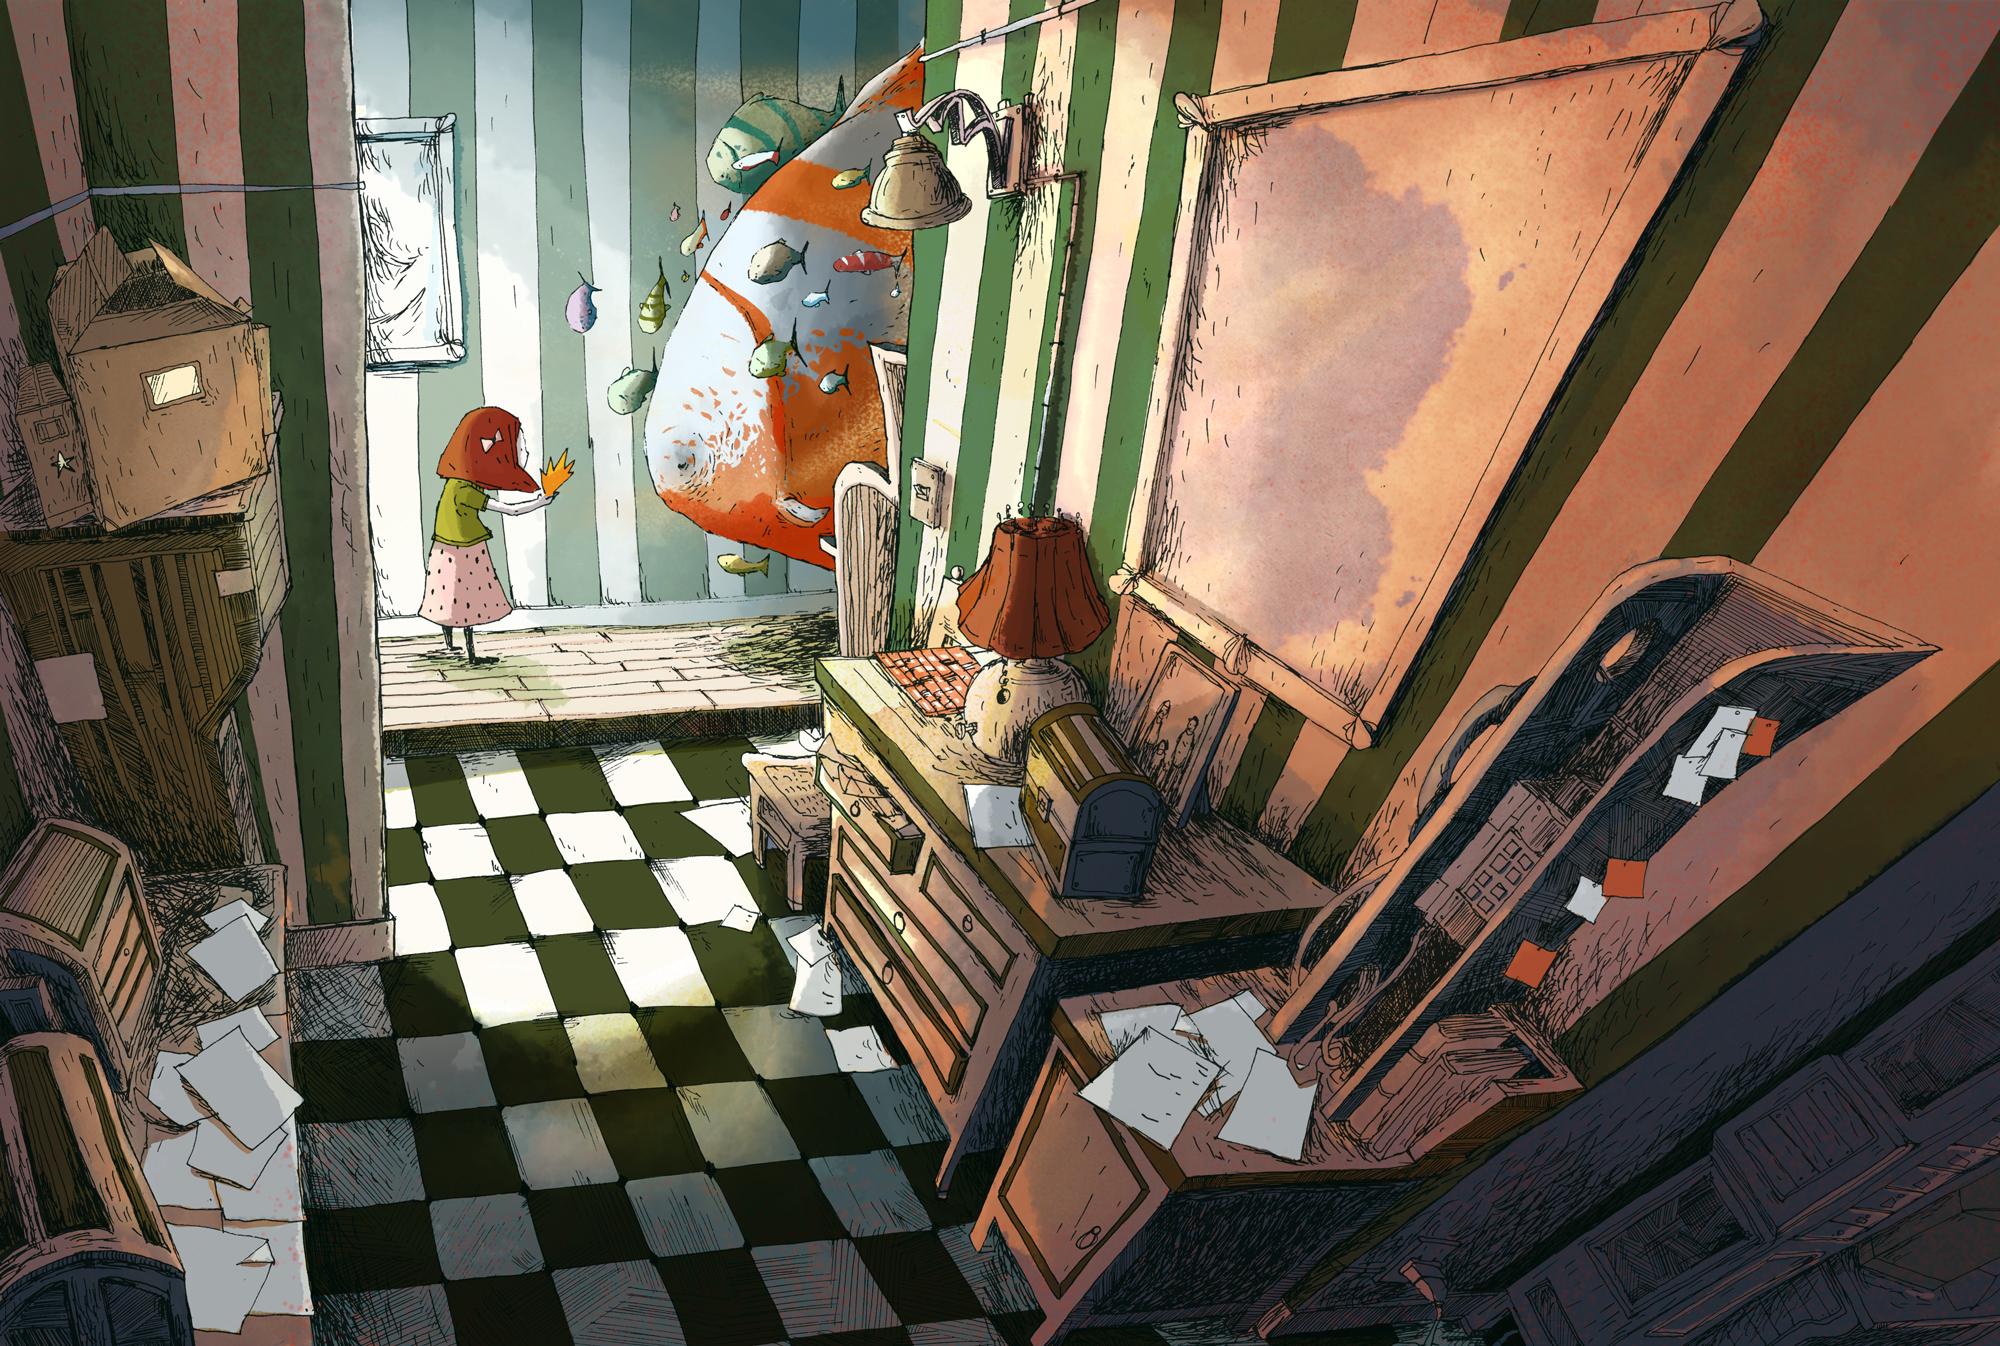 Poisson Appartement - 2010 - illustration Romain Laforet